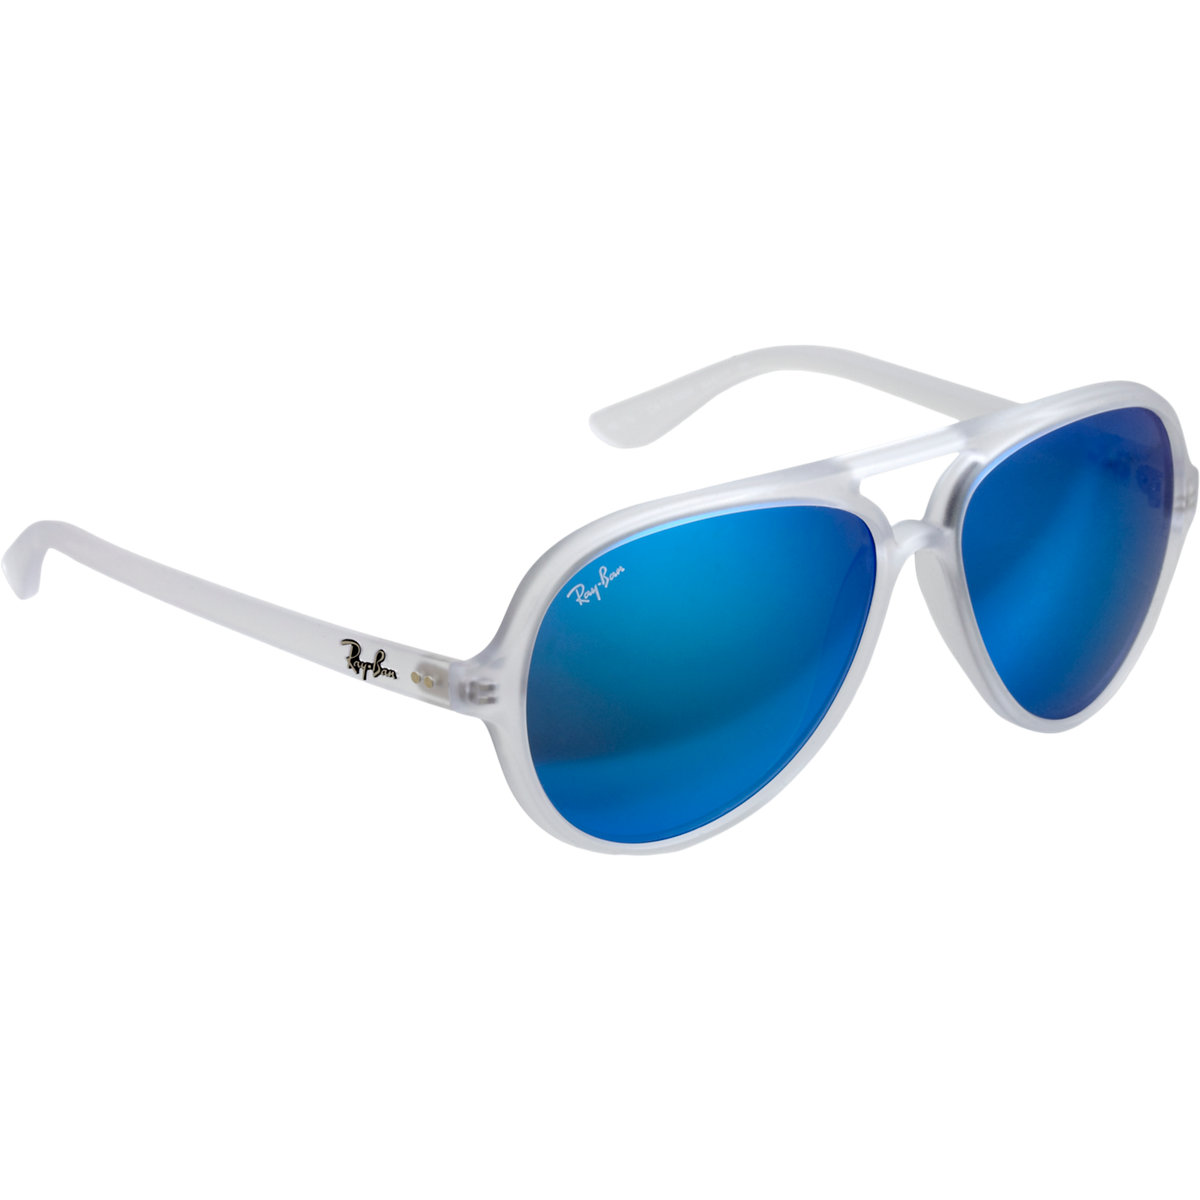 Ray-Ban Transparent Aviator Frame Mirror Lens Sunglasses for Men - Lyst